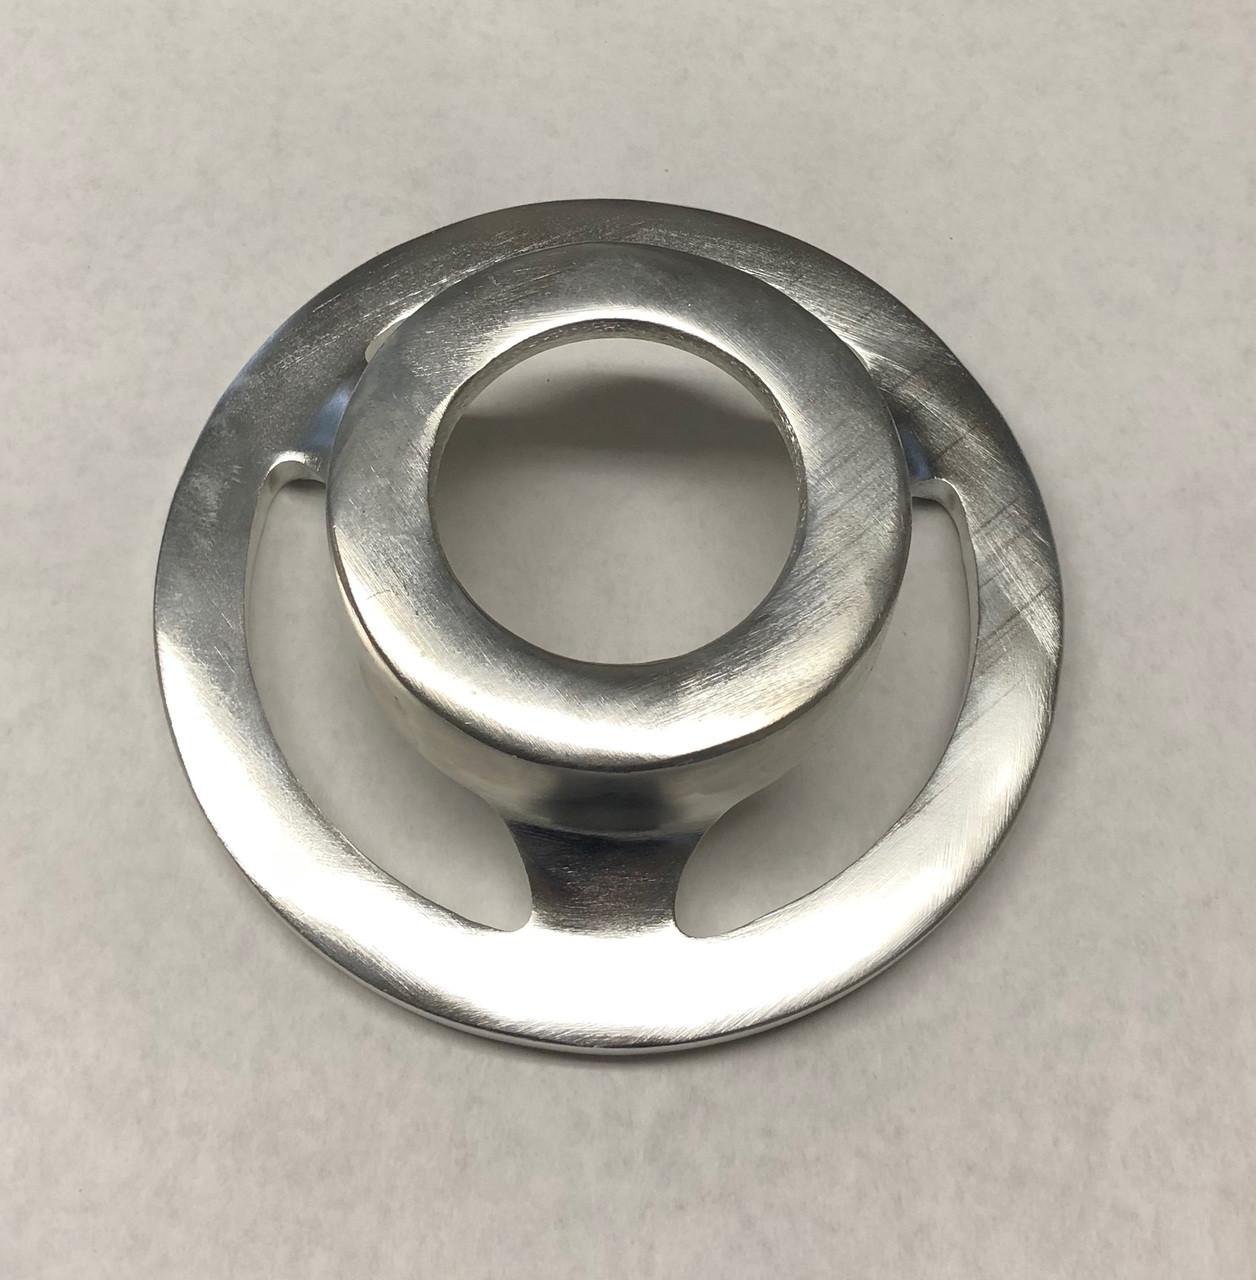 ProCut KG-22W & KG-22W-XP - Ring - 05-70383